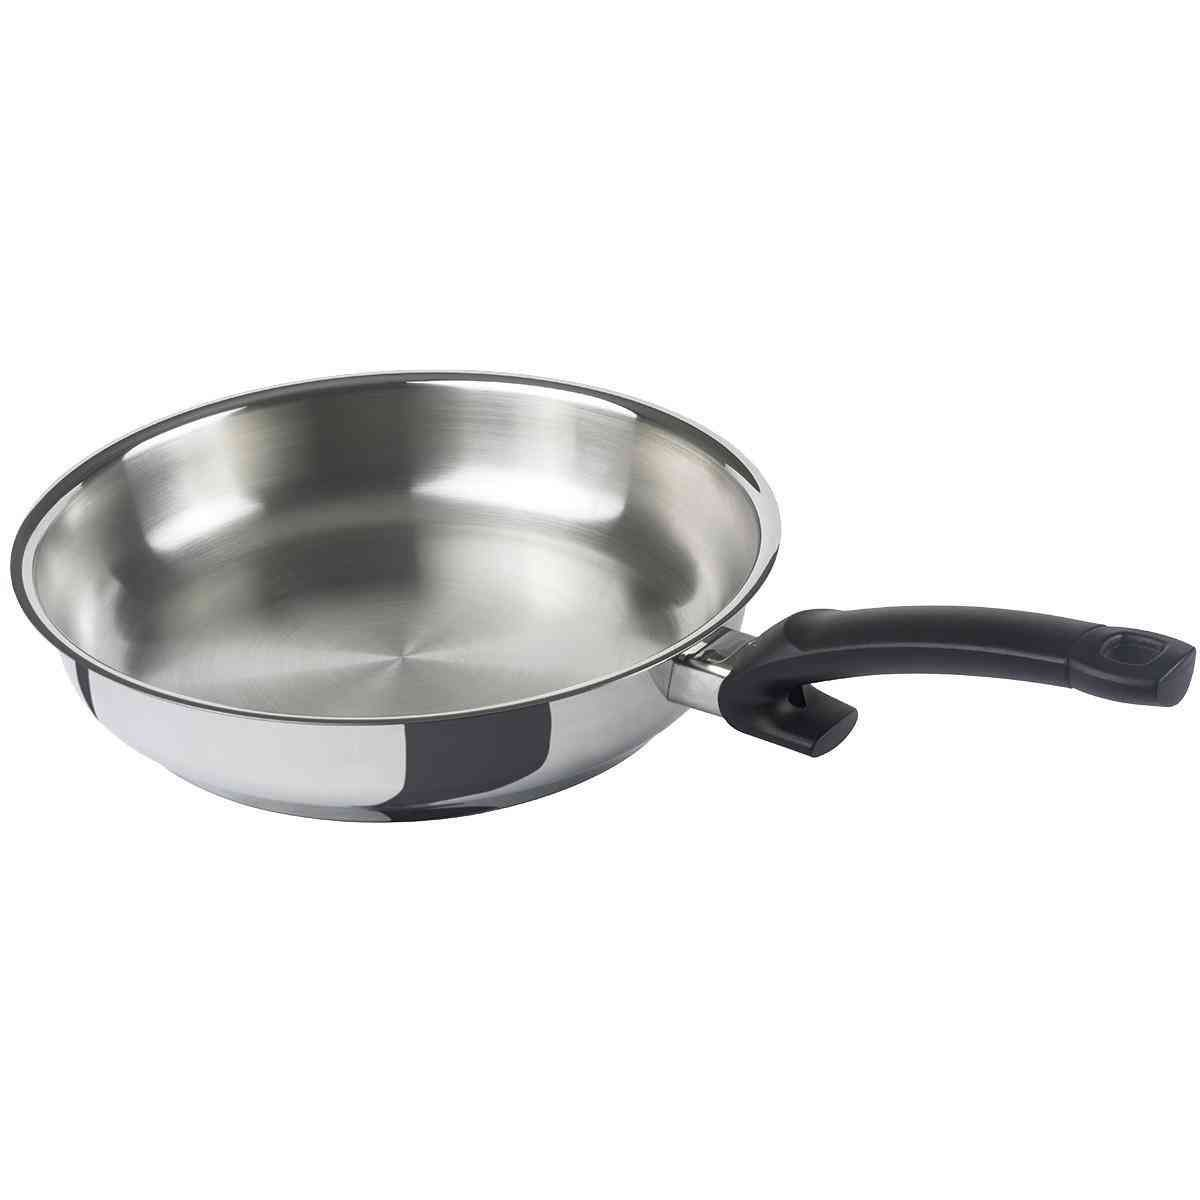 crispy steelux classic pan 24 cm